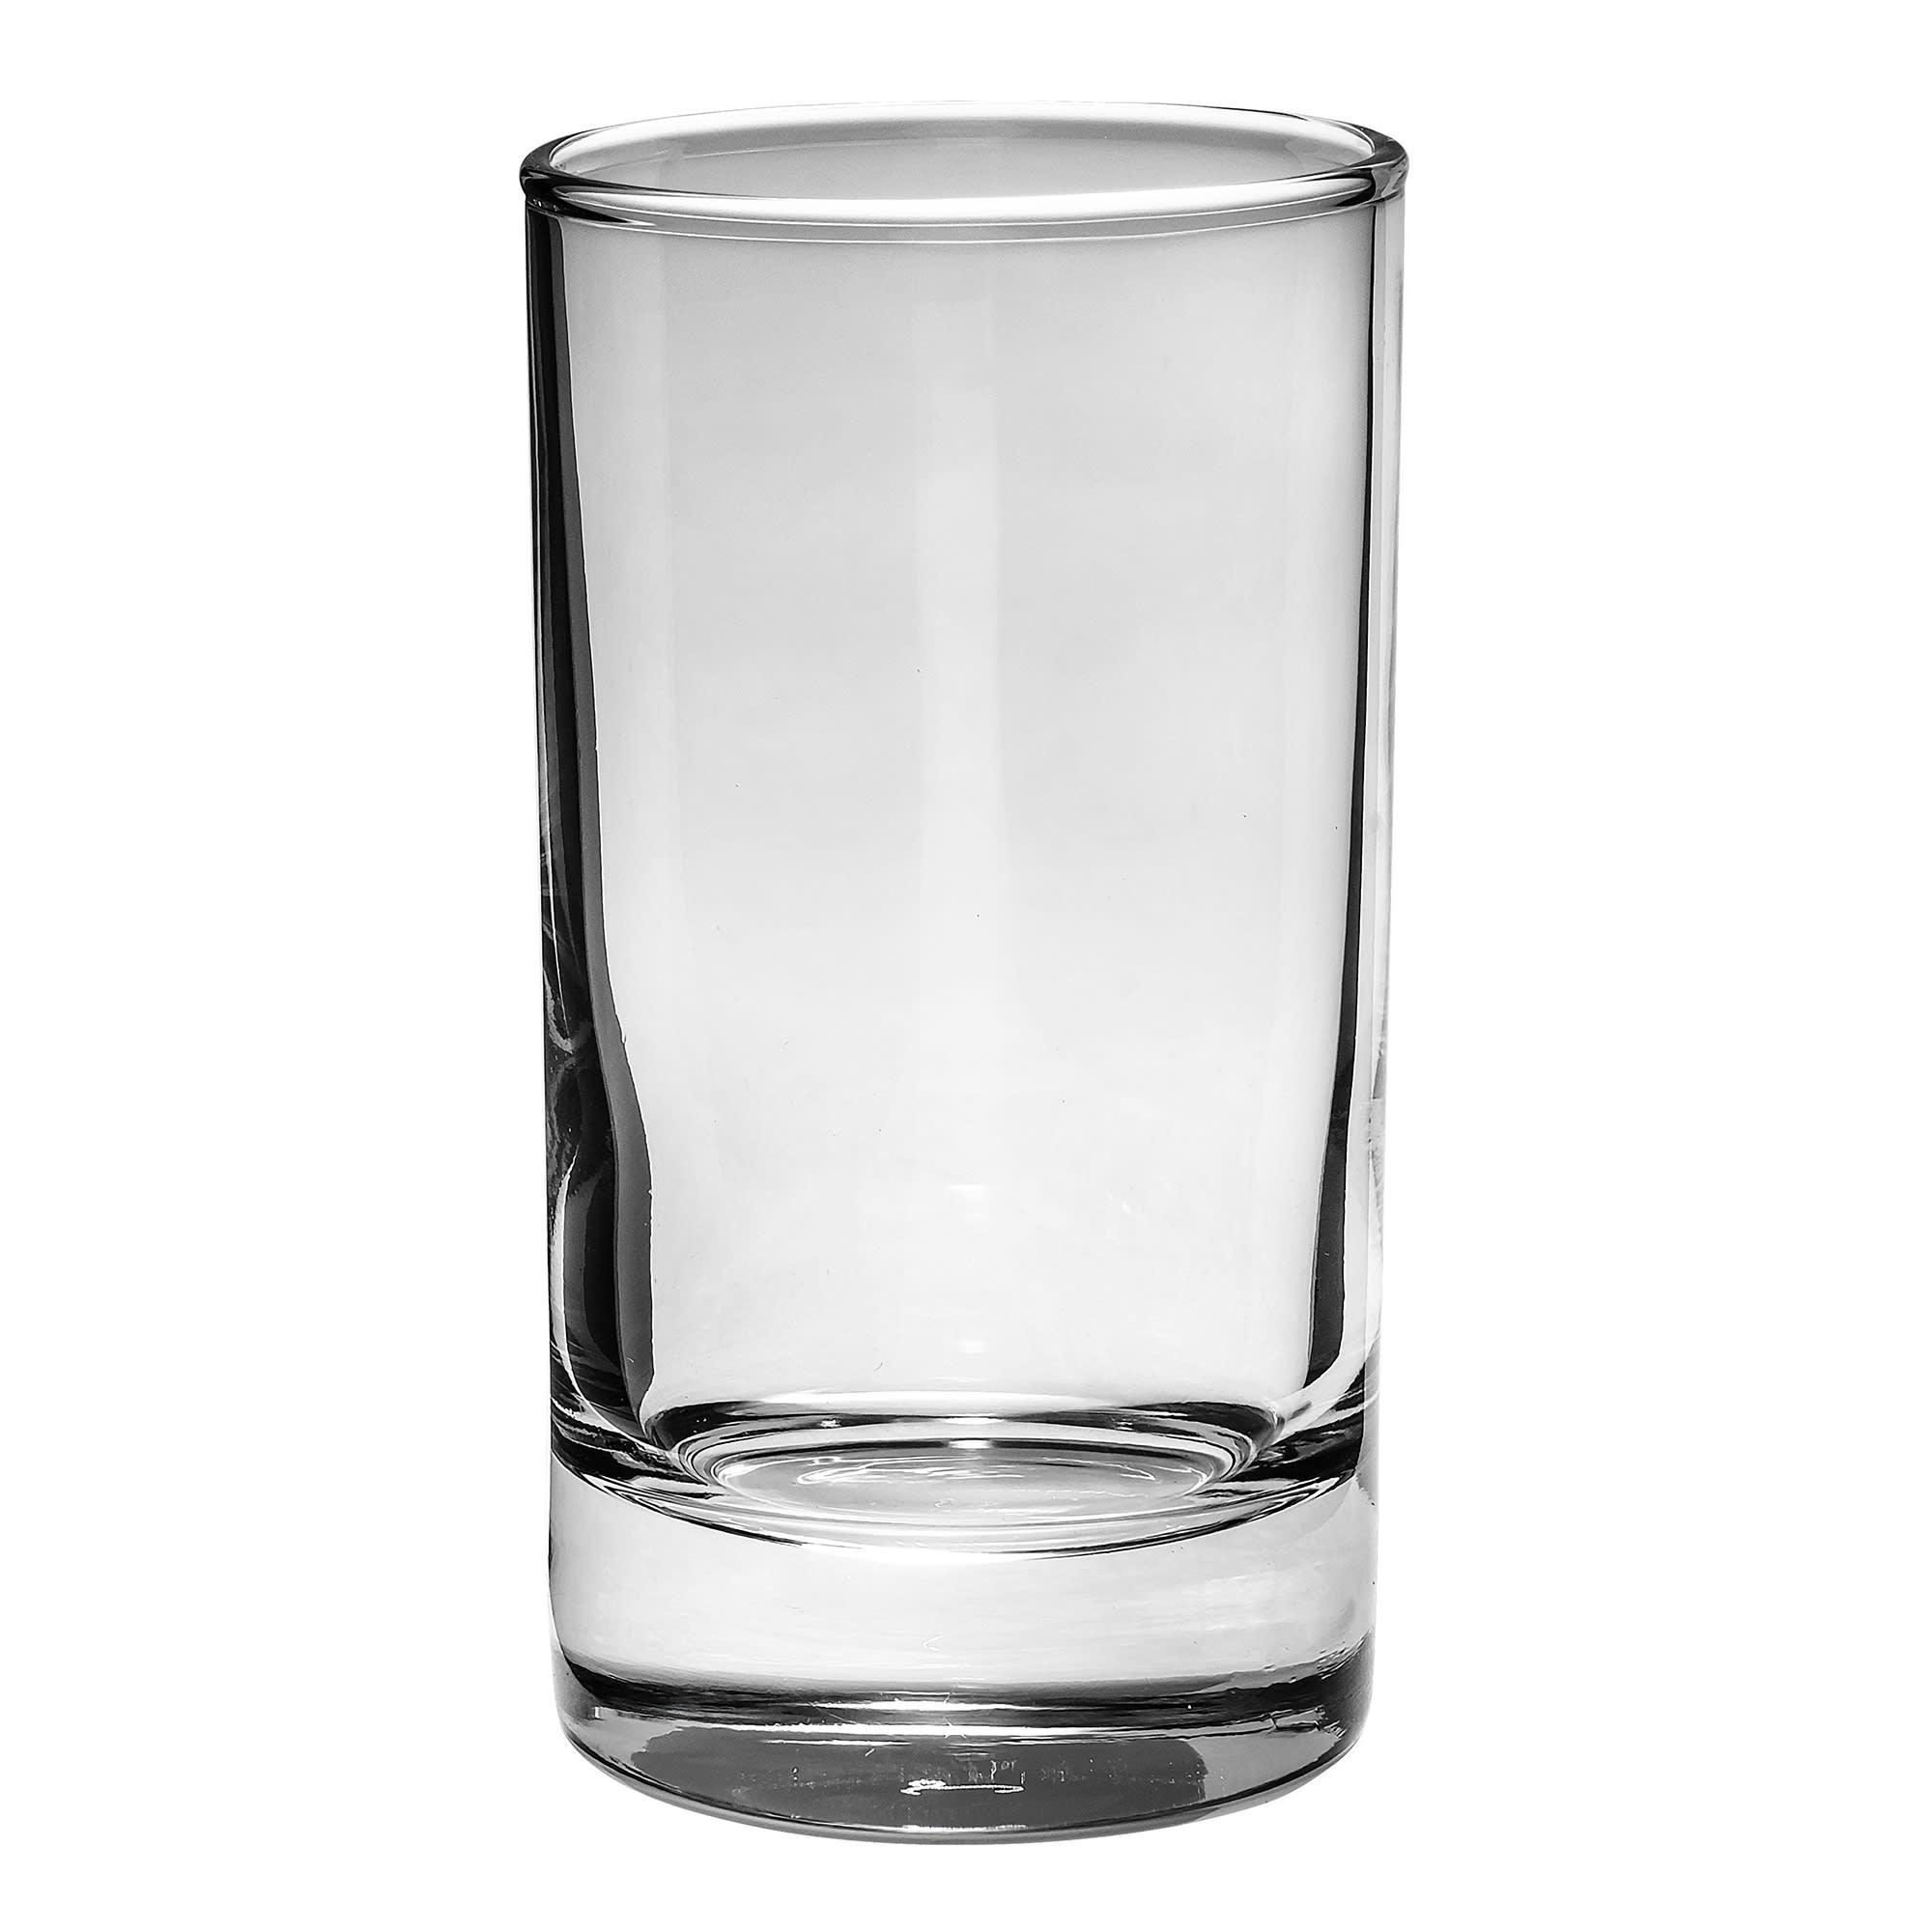 Libbey 2523 4.75-oz Chicago Juice Glass - Safedge Rim Guarantee